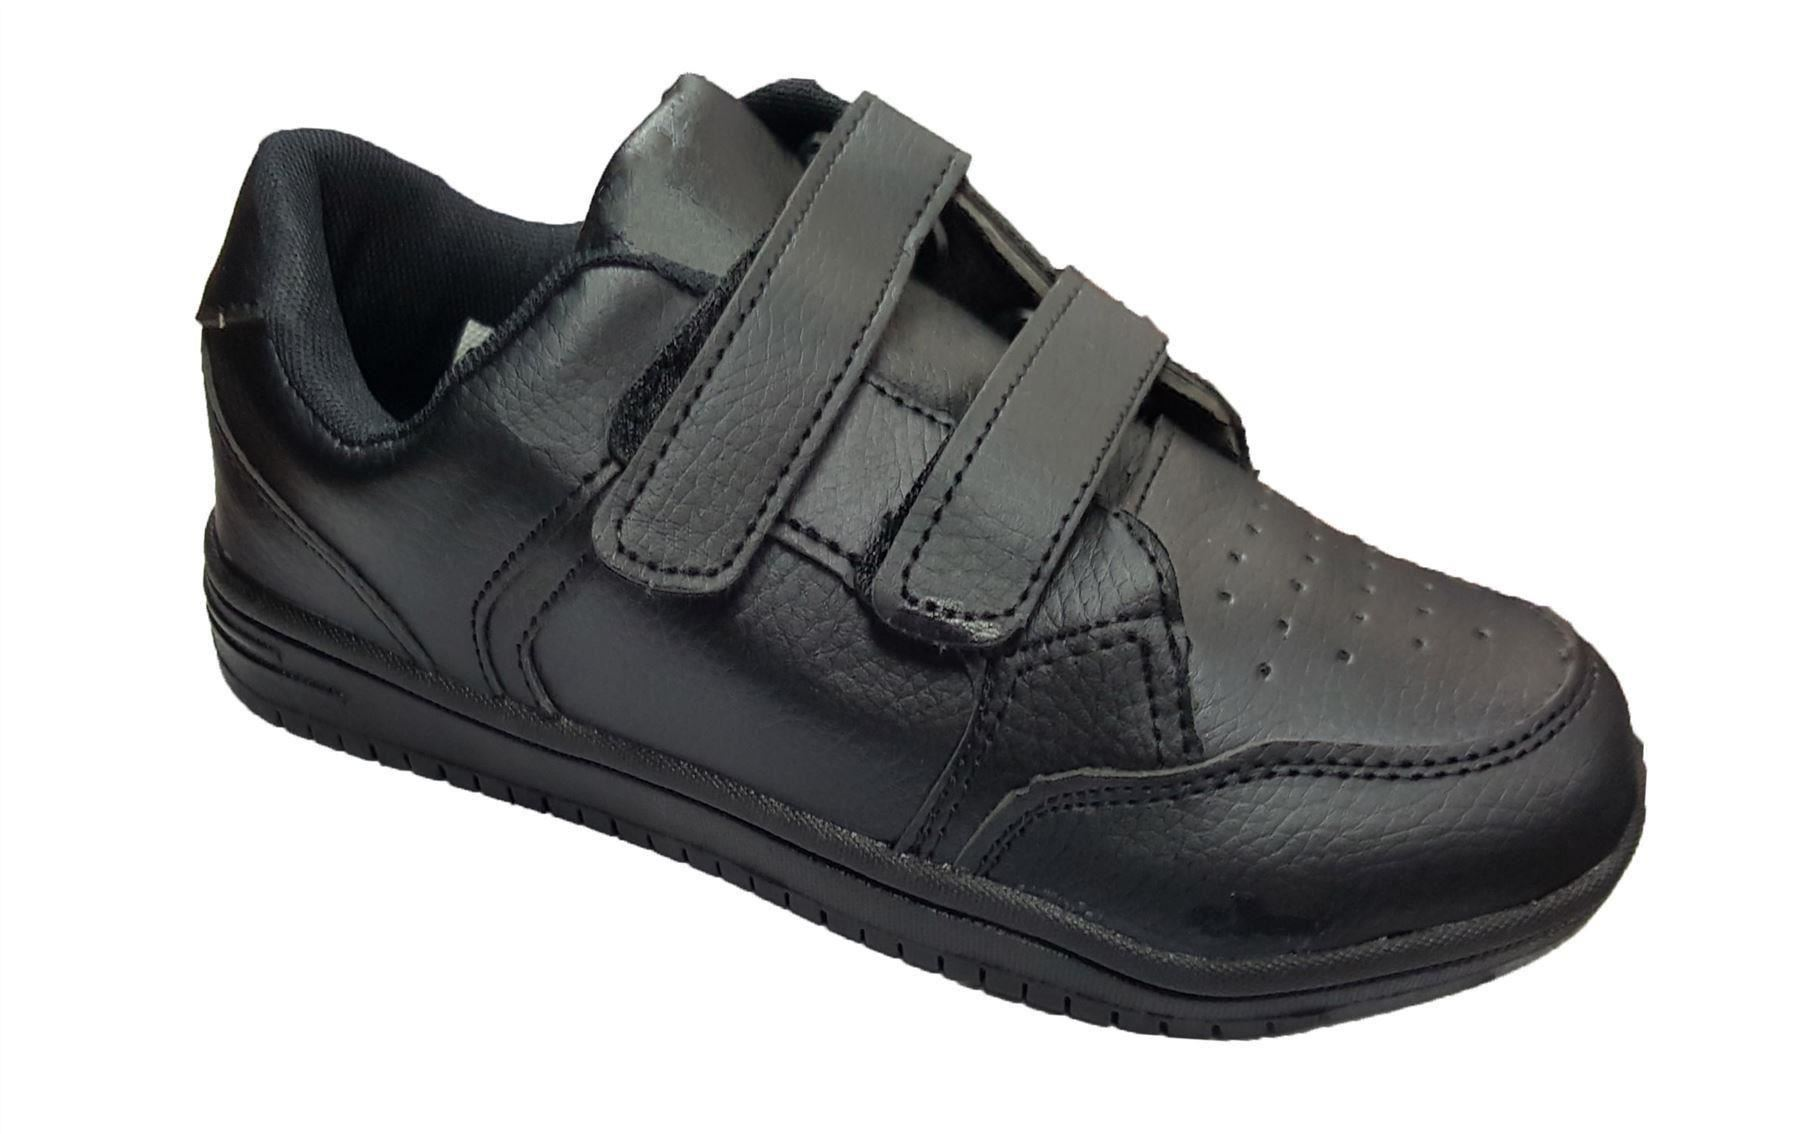 Boys Black Velcro School Shoes